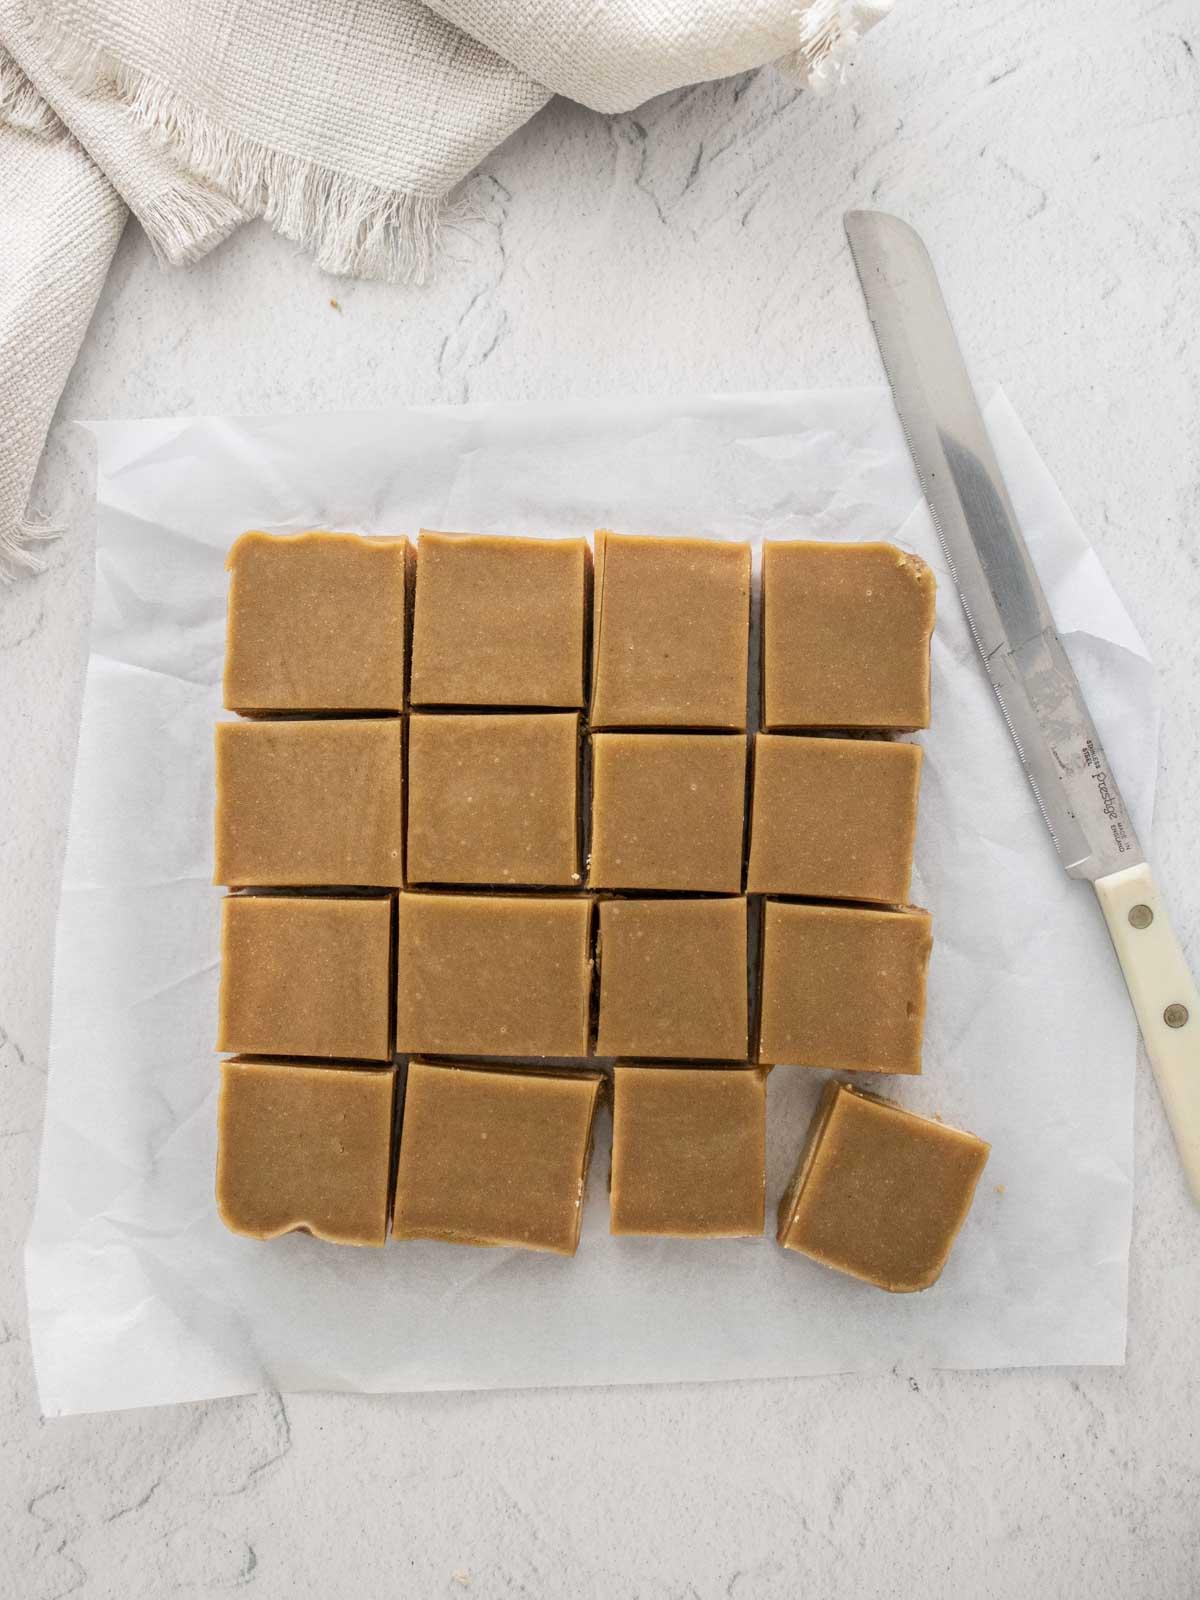 Sliced ginger crunch